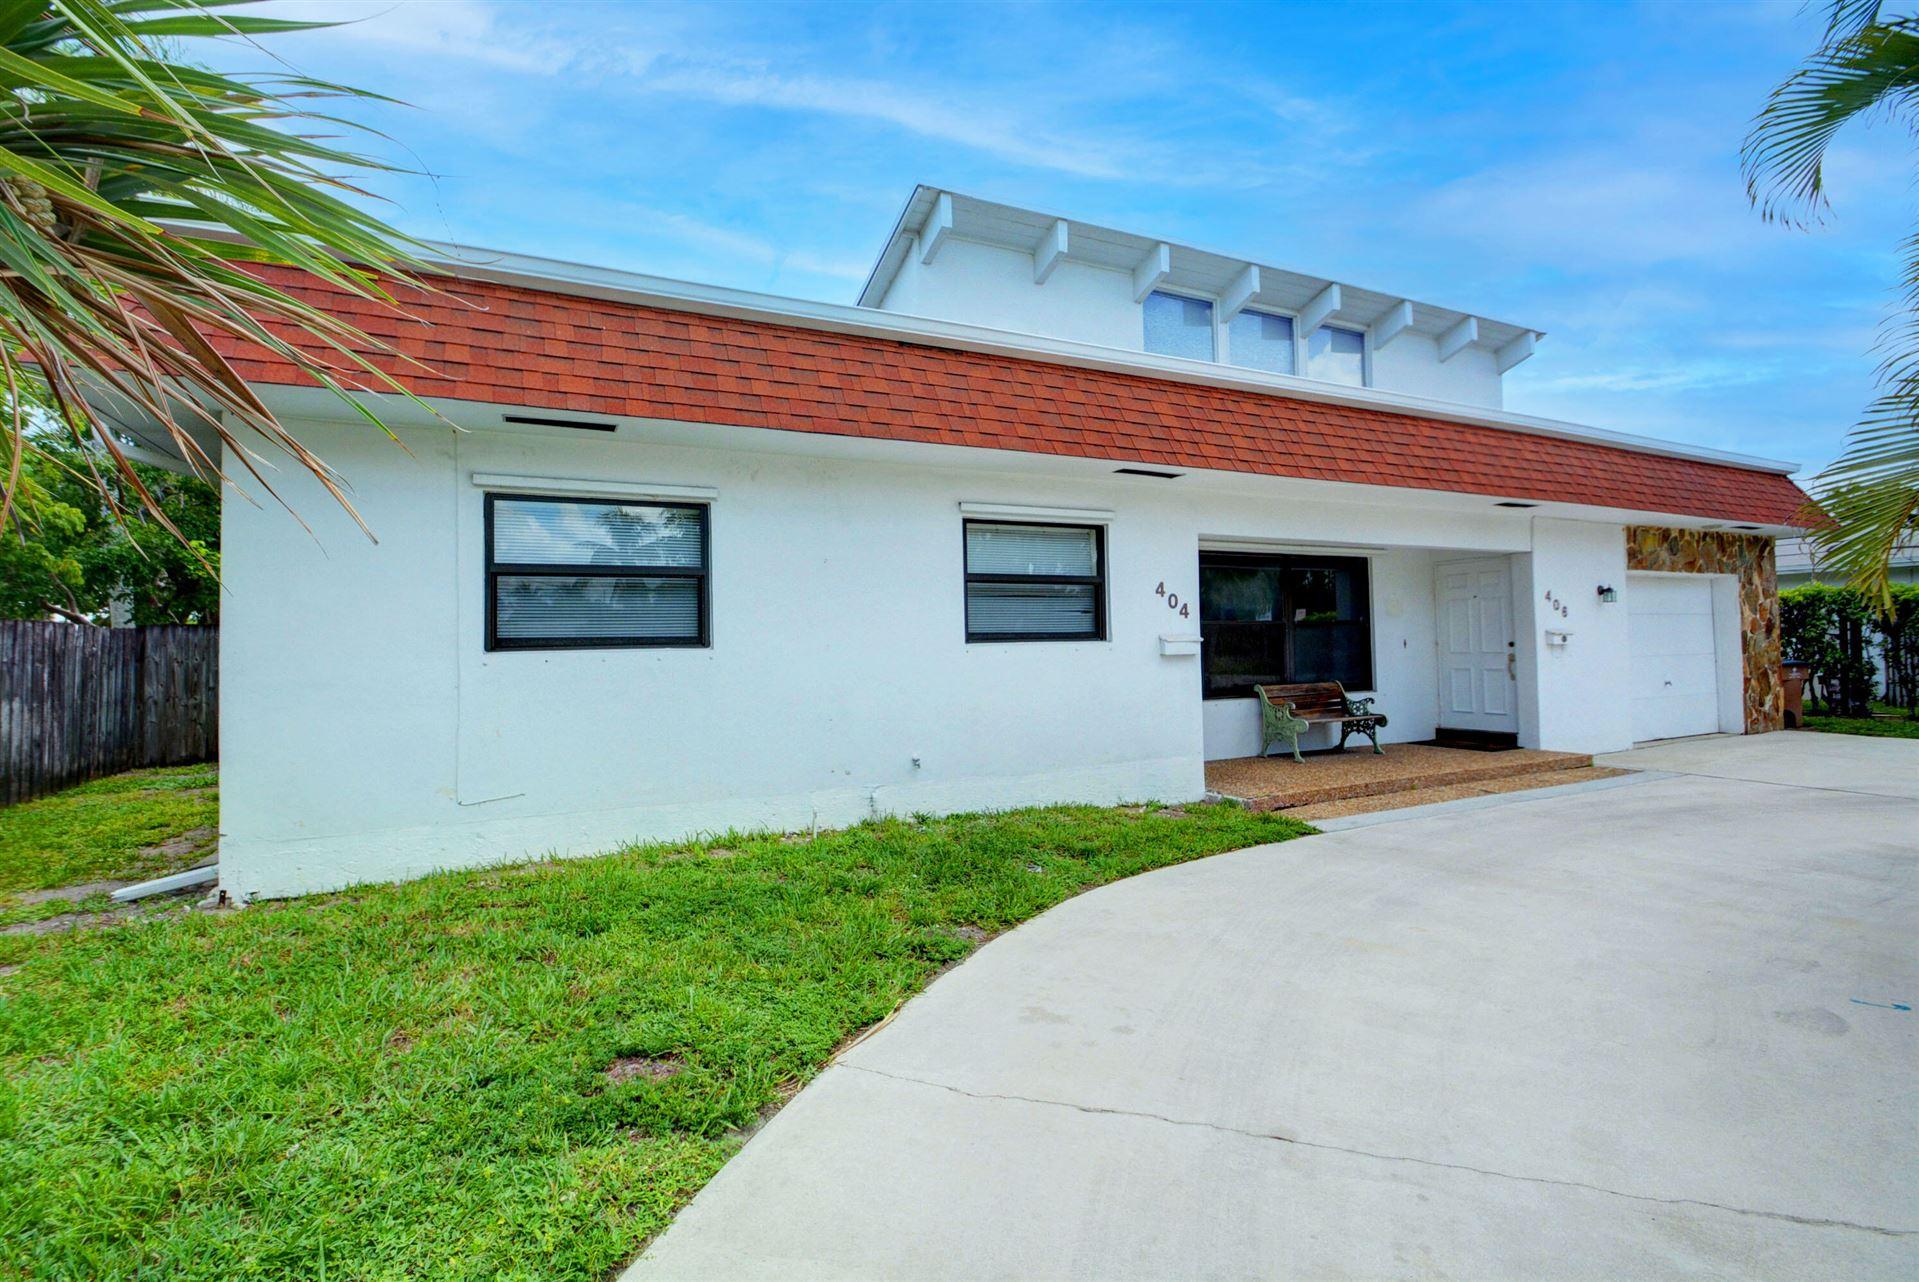 404 SE 6th Avenue, Deerfield Beach, FL 33441 - #: RX-10732680